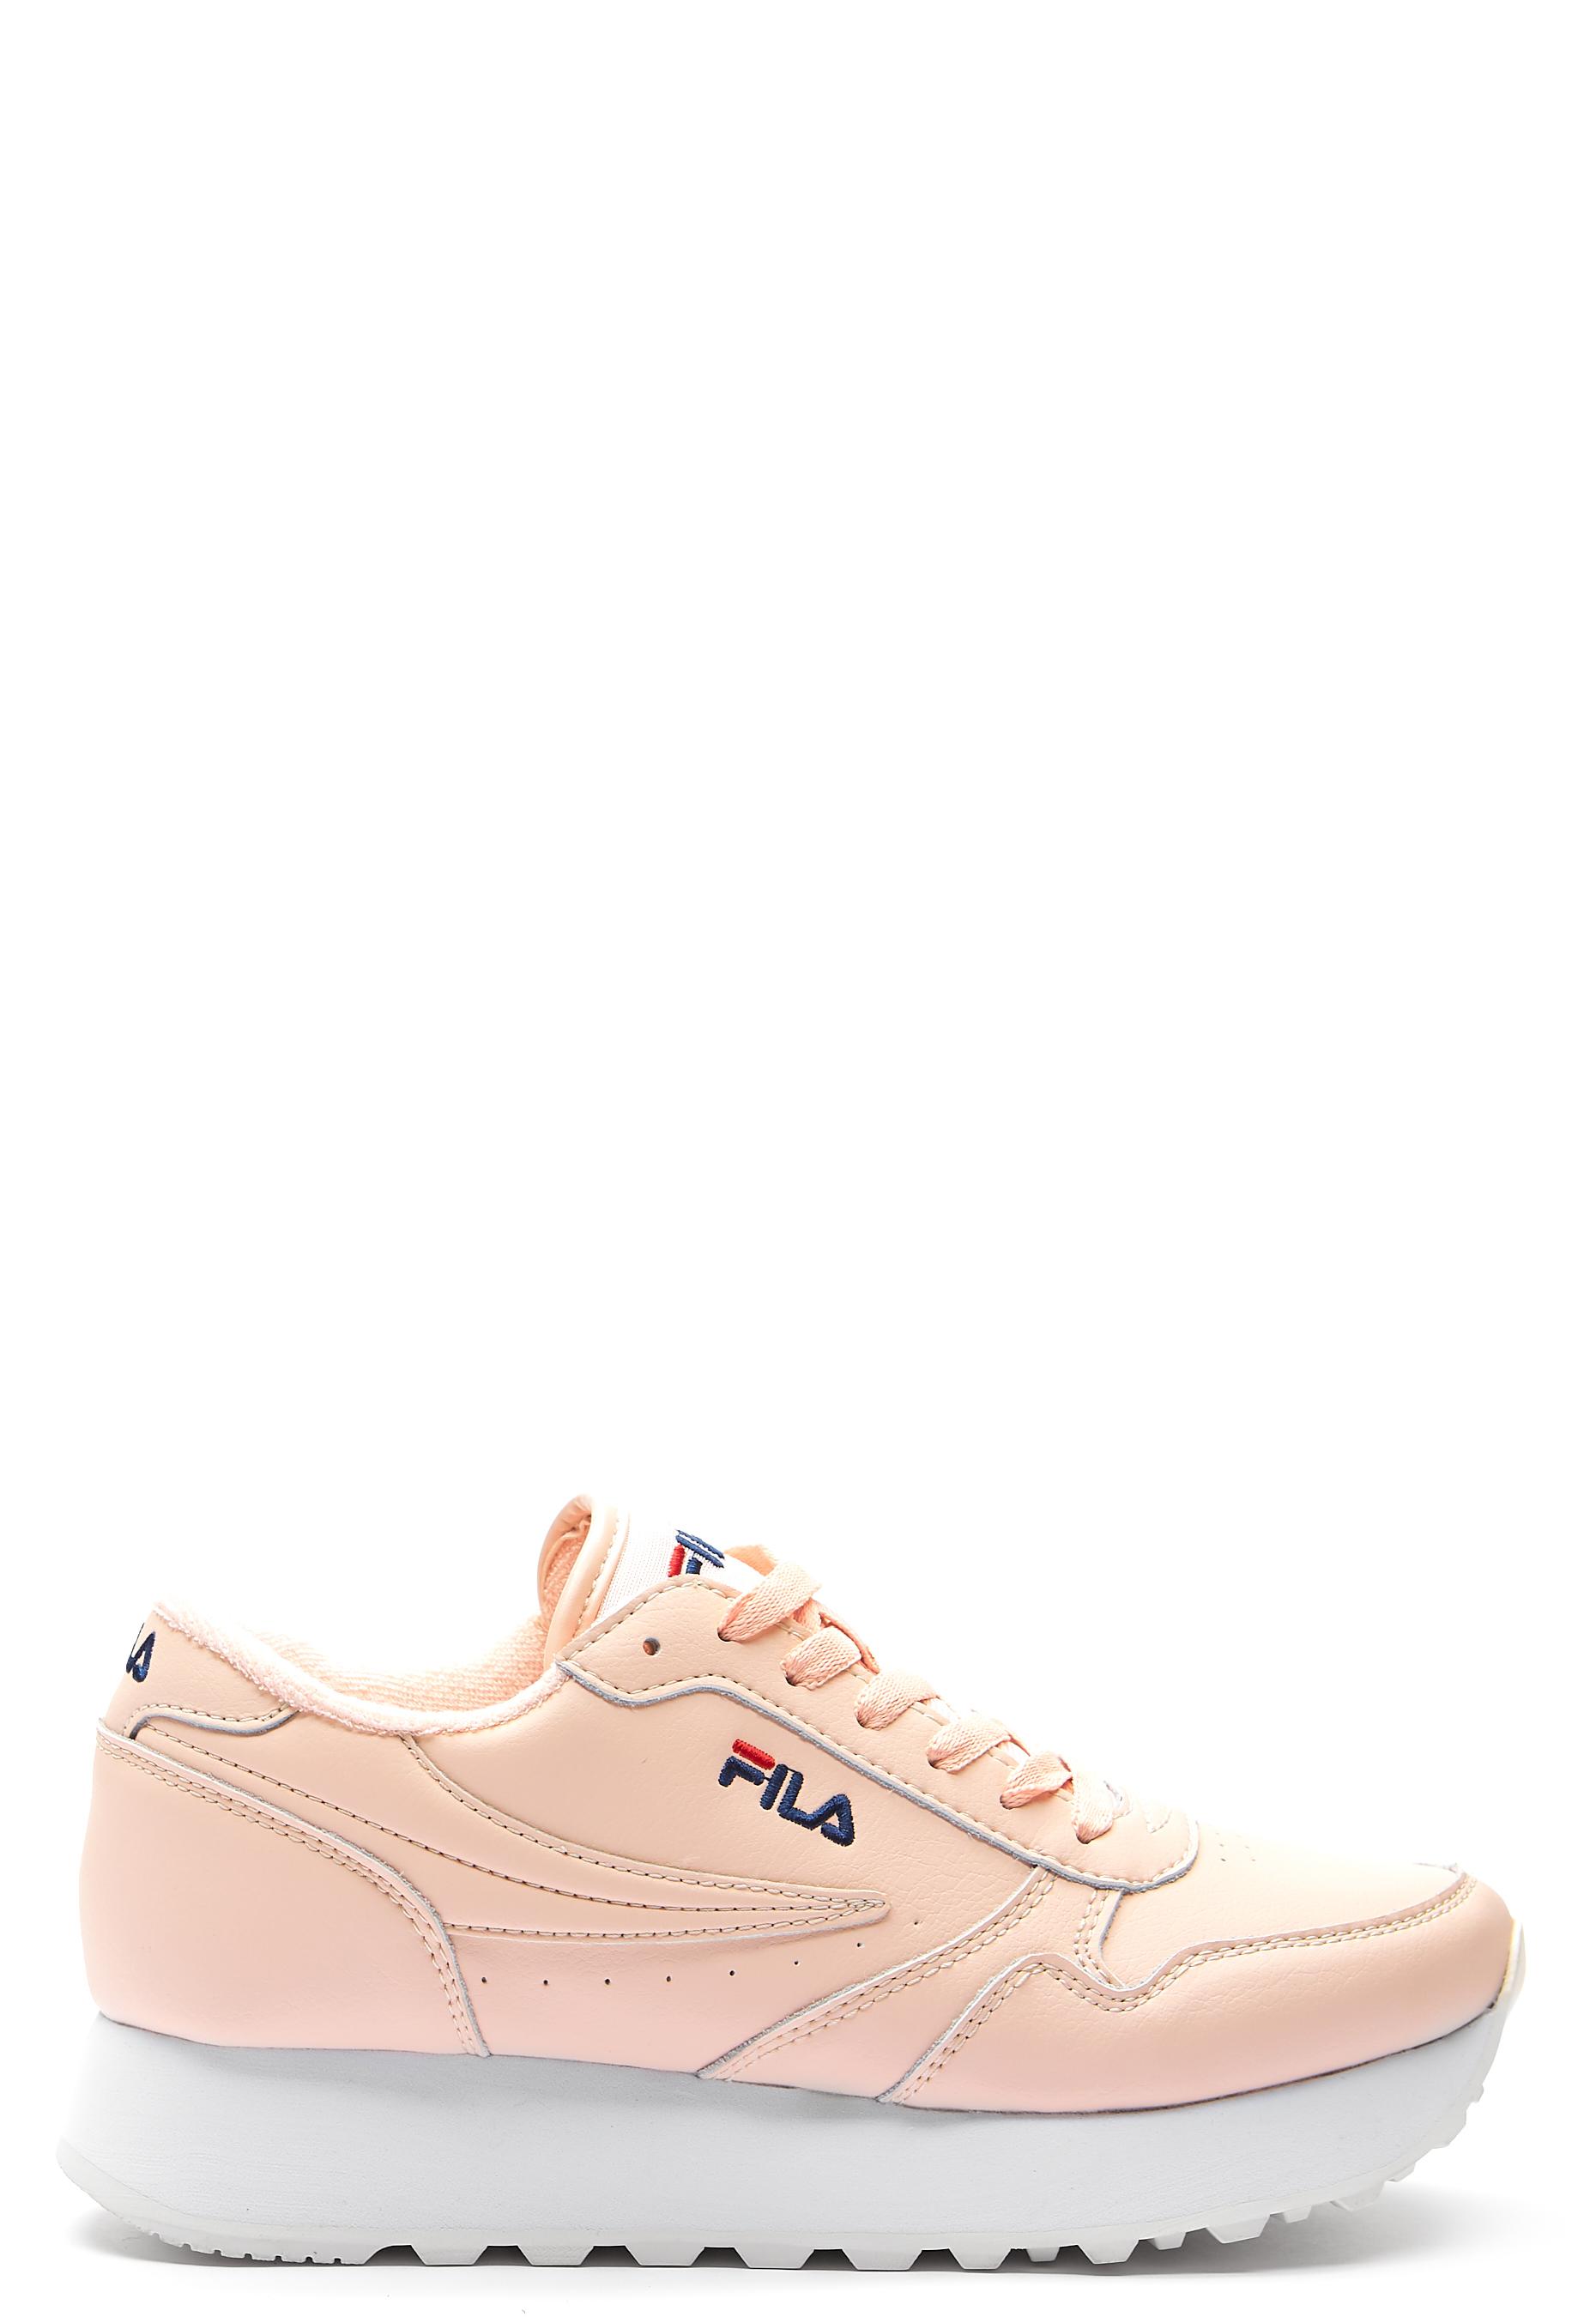 589def3e83b FILA Orbit Zeppa L Shoes Peach Whip - Bubbleroom